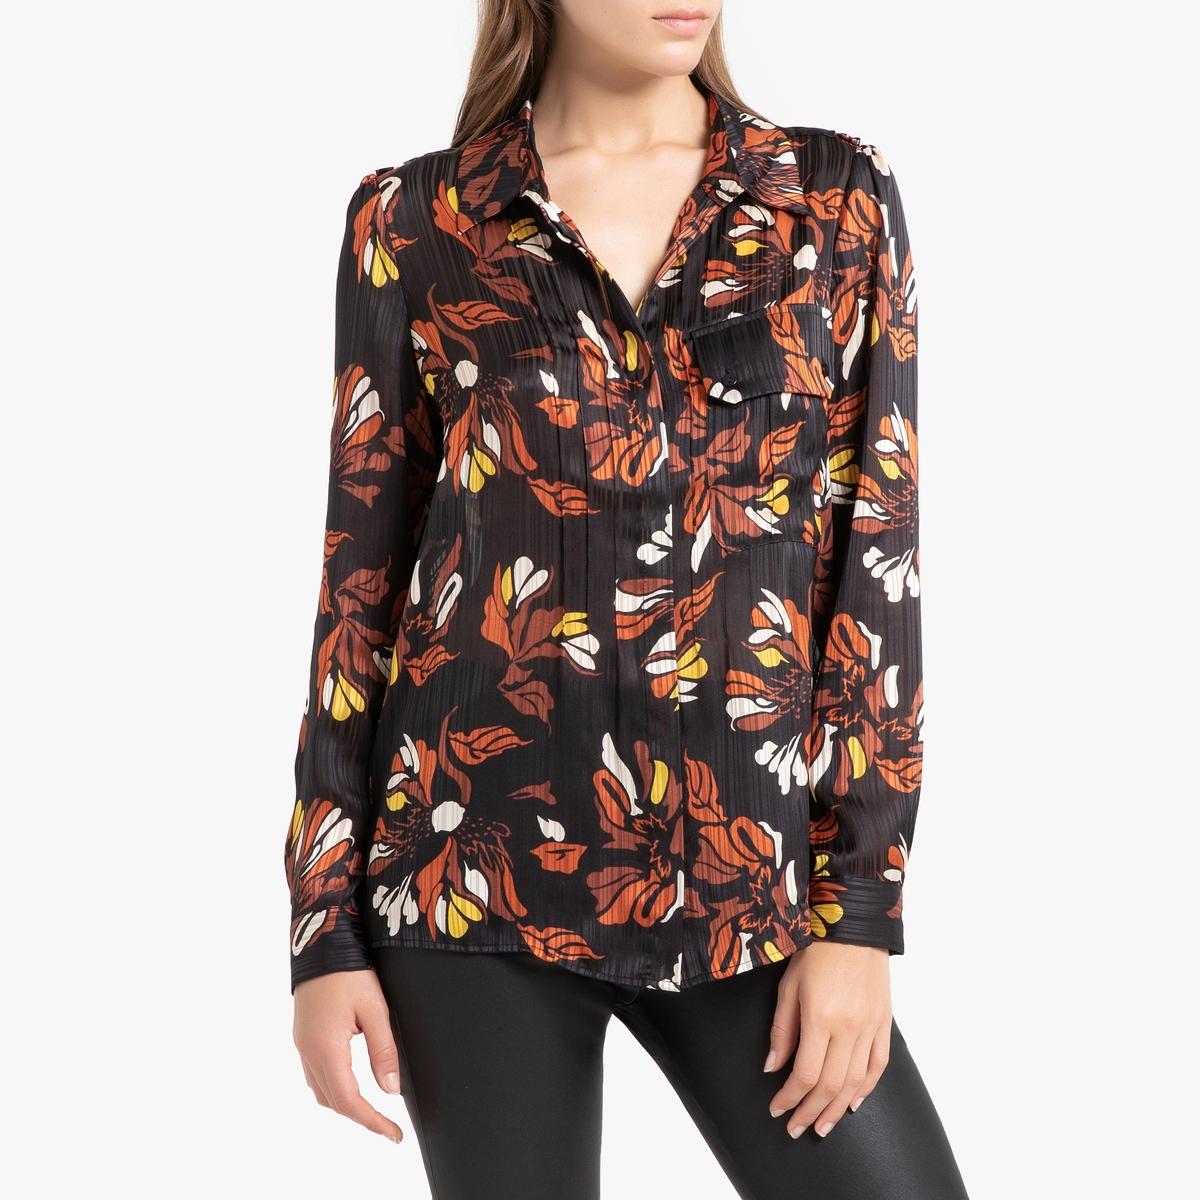 Блузка La Redoute С рисунком и длинными рукавами AVA 1(S) черный блуза la redoute с рисунком и длинными рукавами s синий